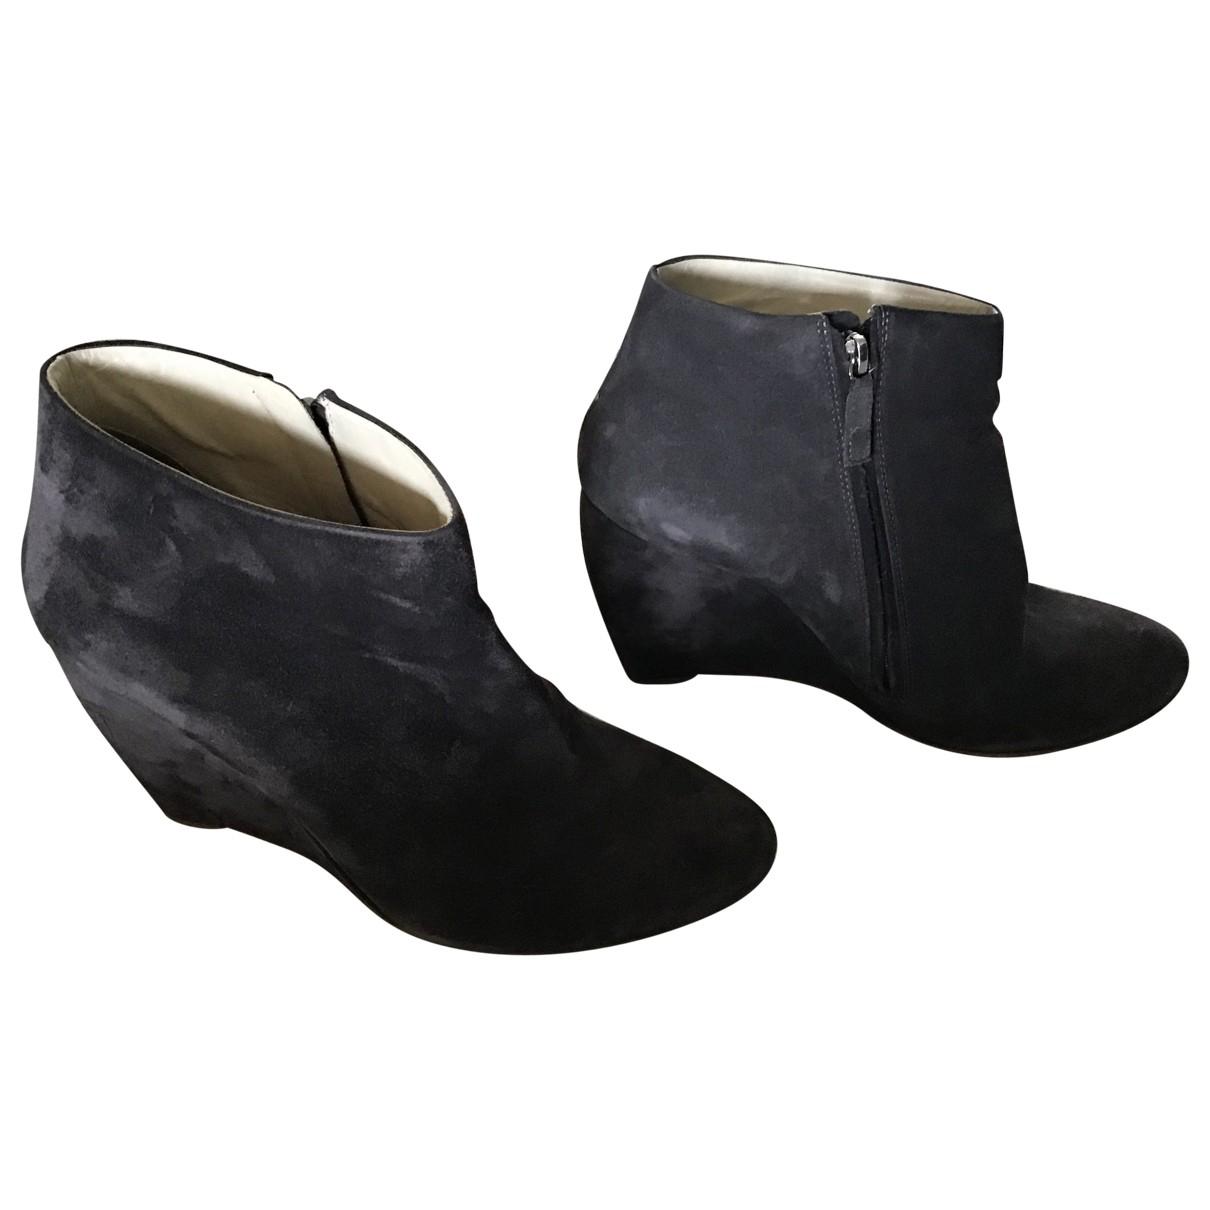 Rupert Sanderson N Grey Suede Ankle boots for Women 41 EU